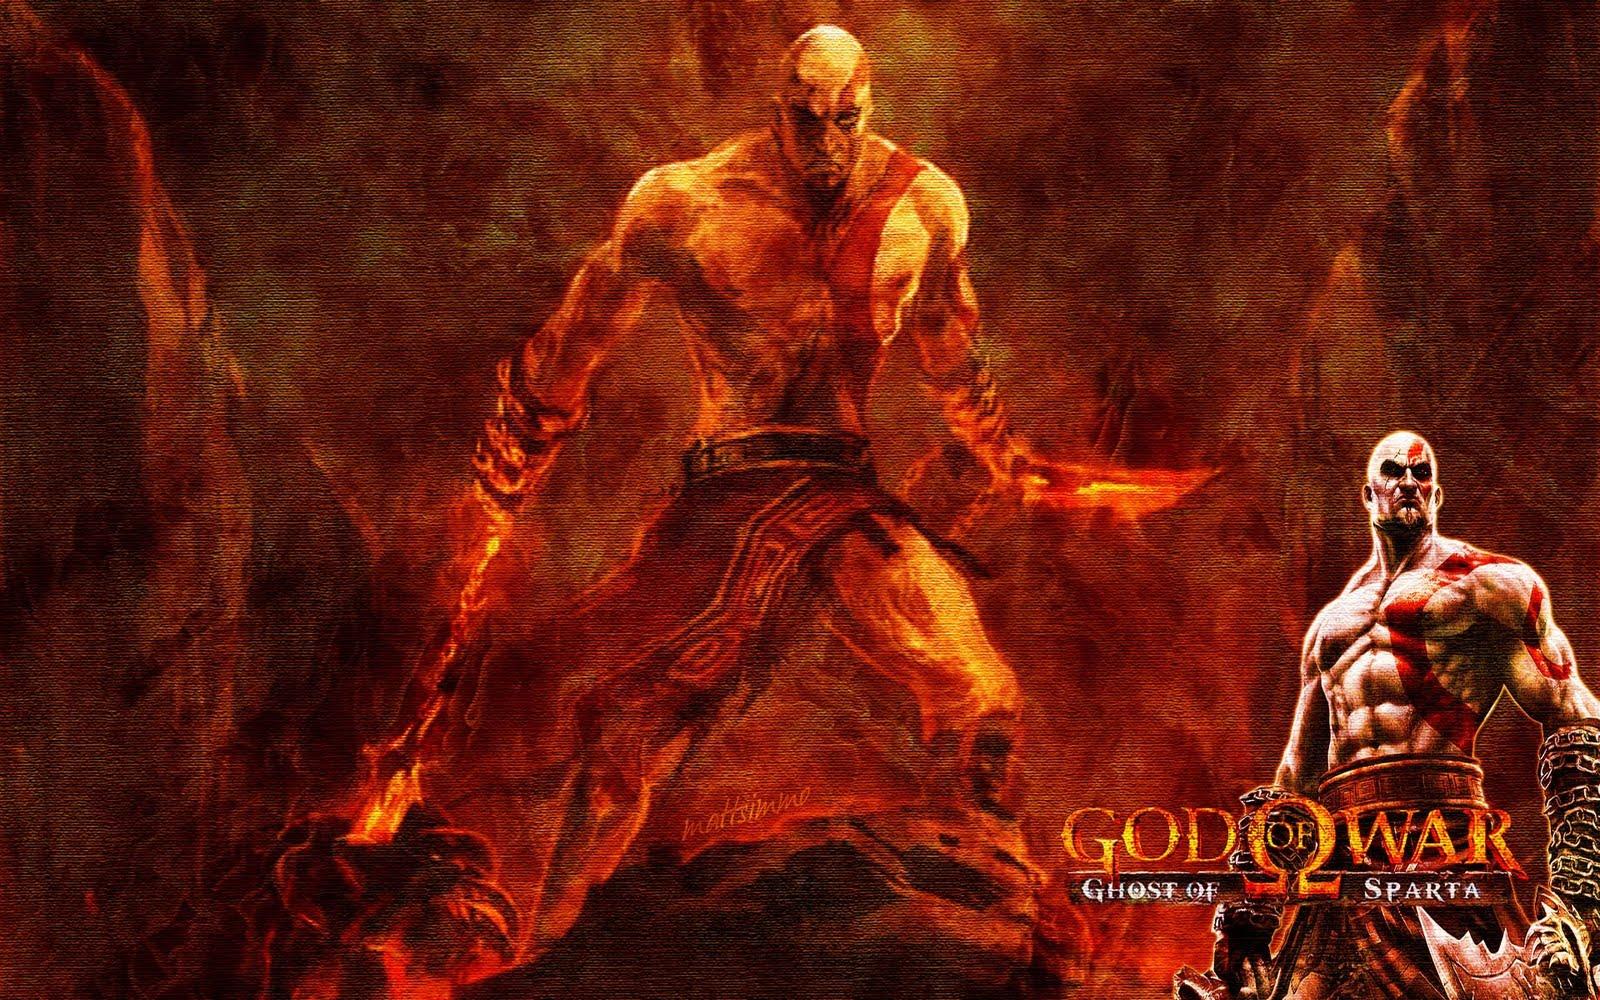 Top 10 Punto Medio Noticias | God Of War 3 Ps3 Full Game Download